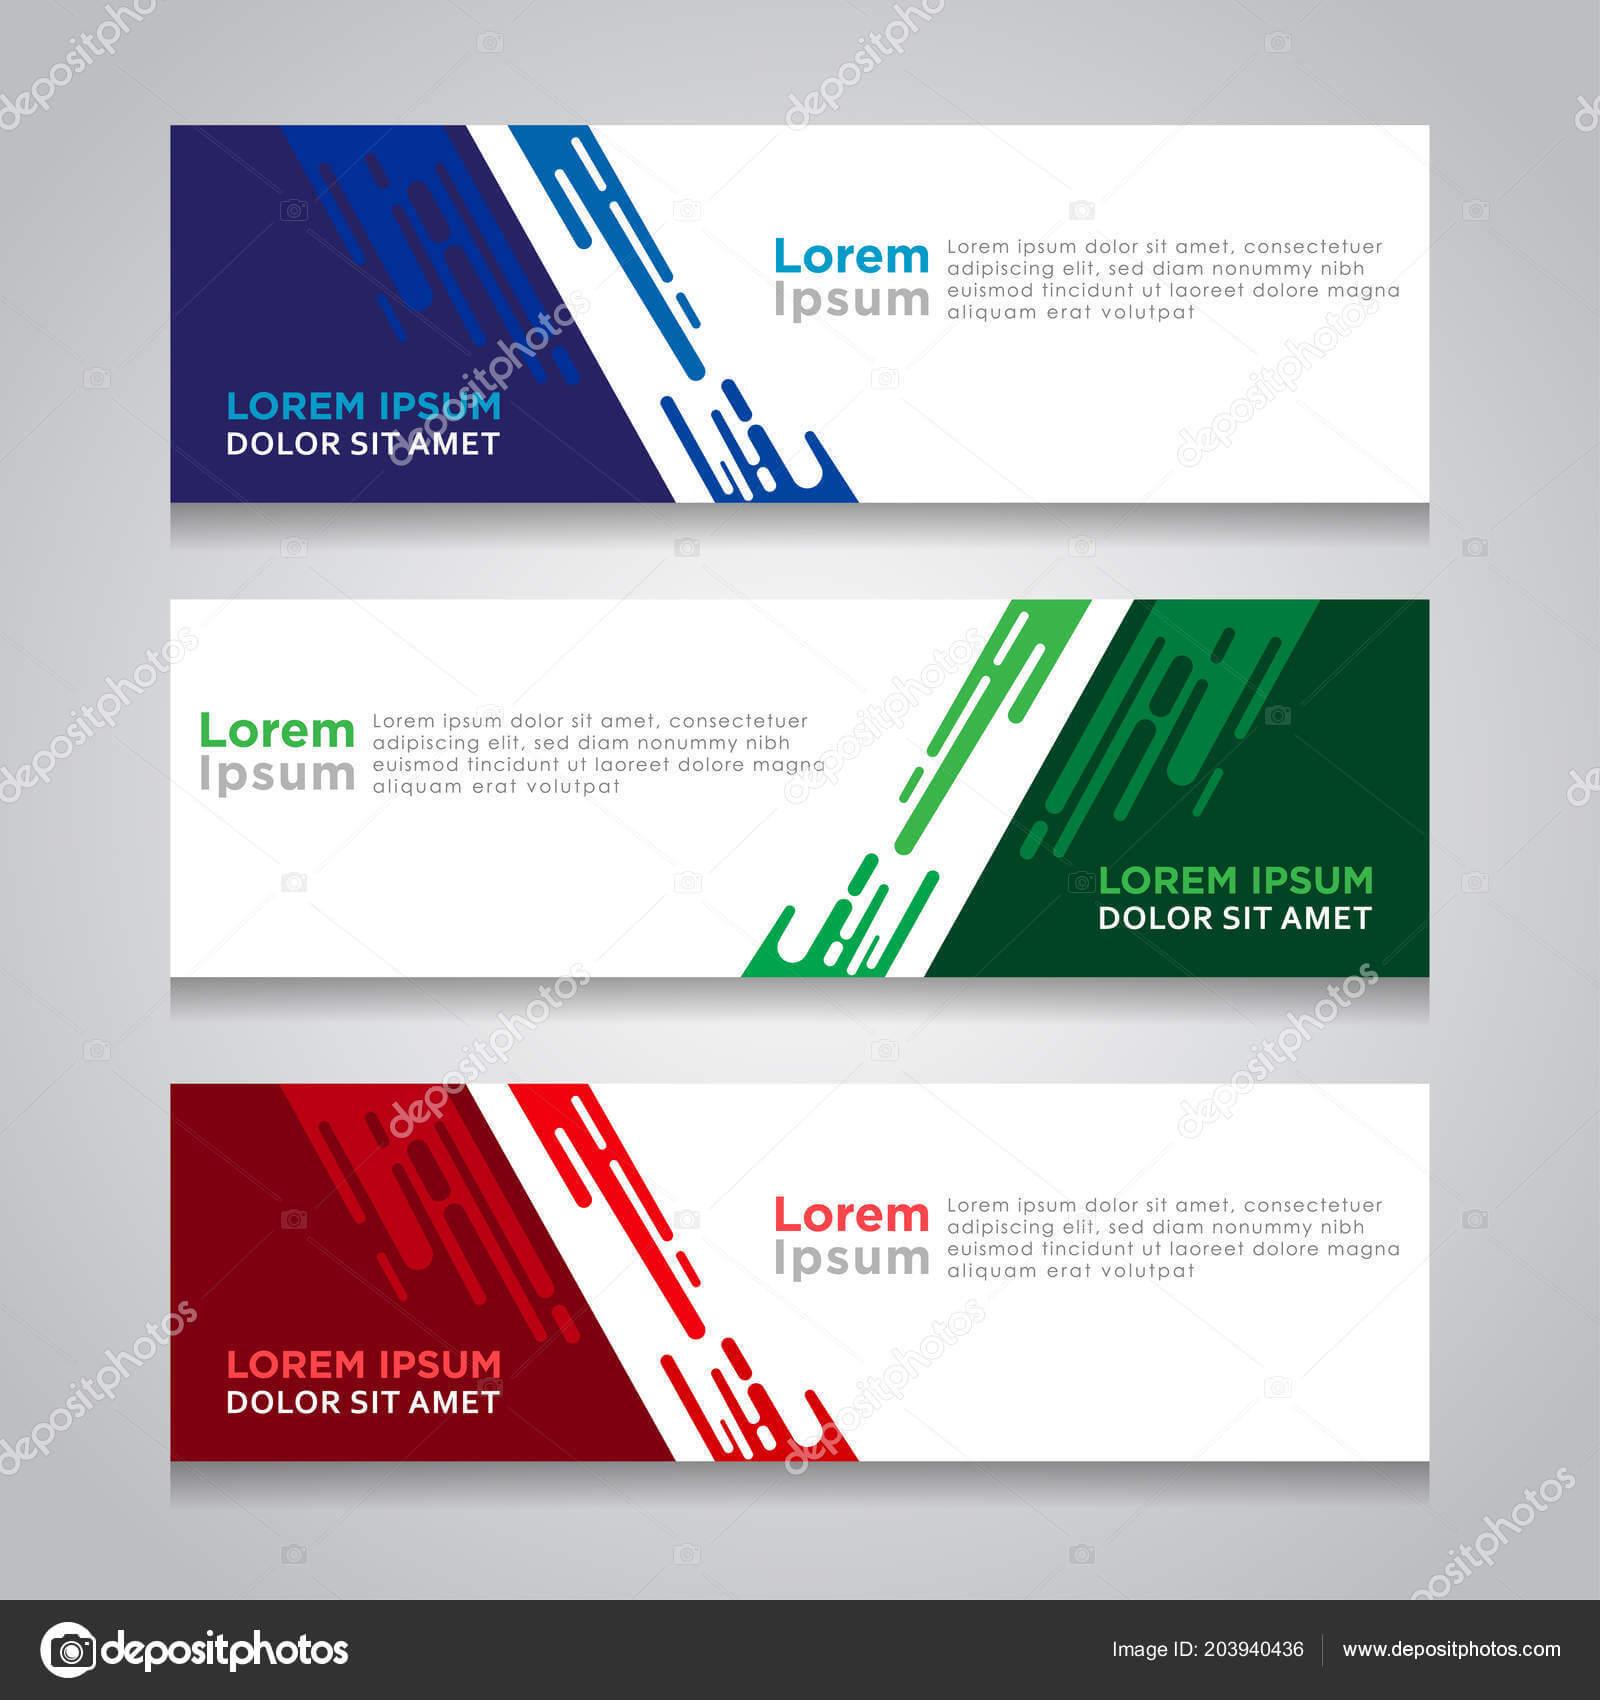 Abstract Web Banner Design Background Header Templates Inside Website Banner Design Templates